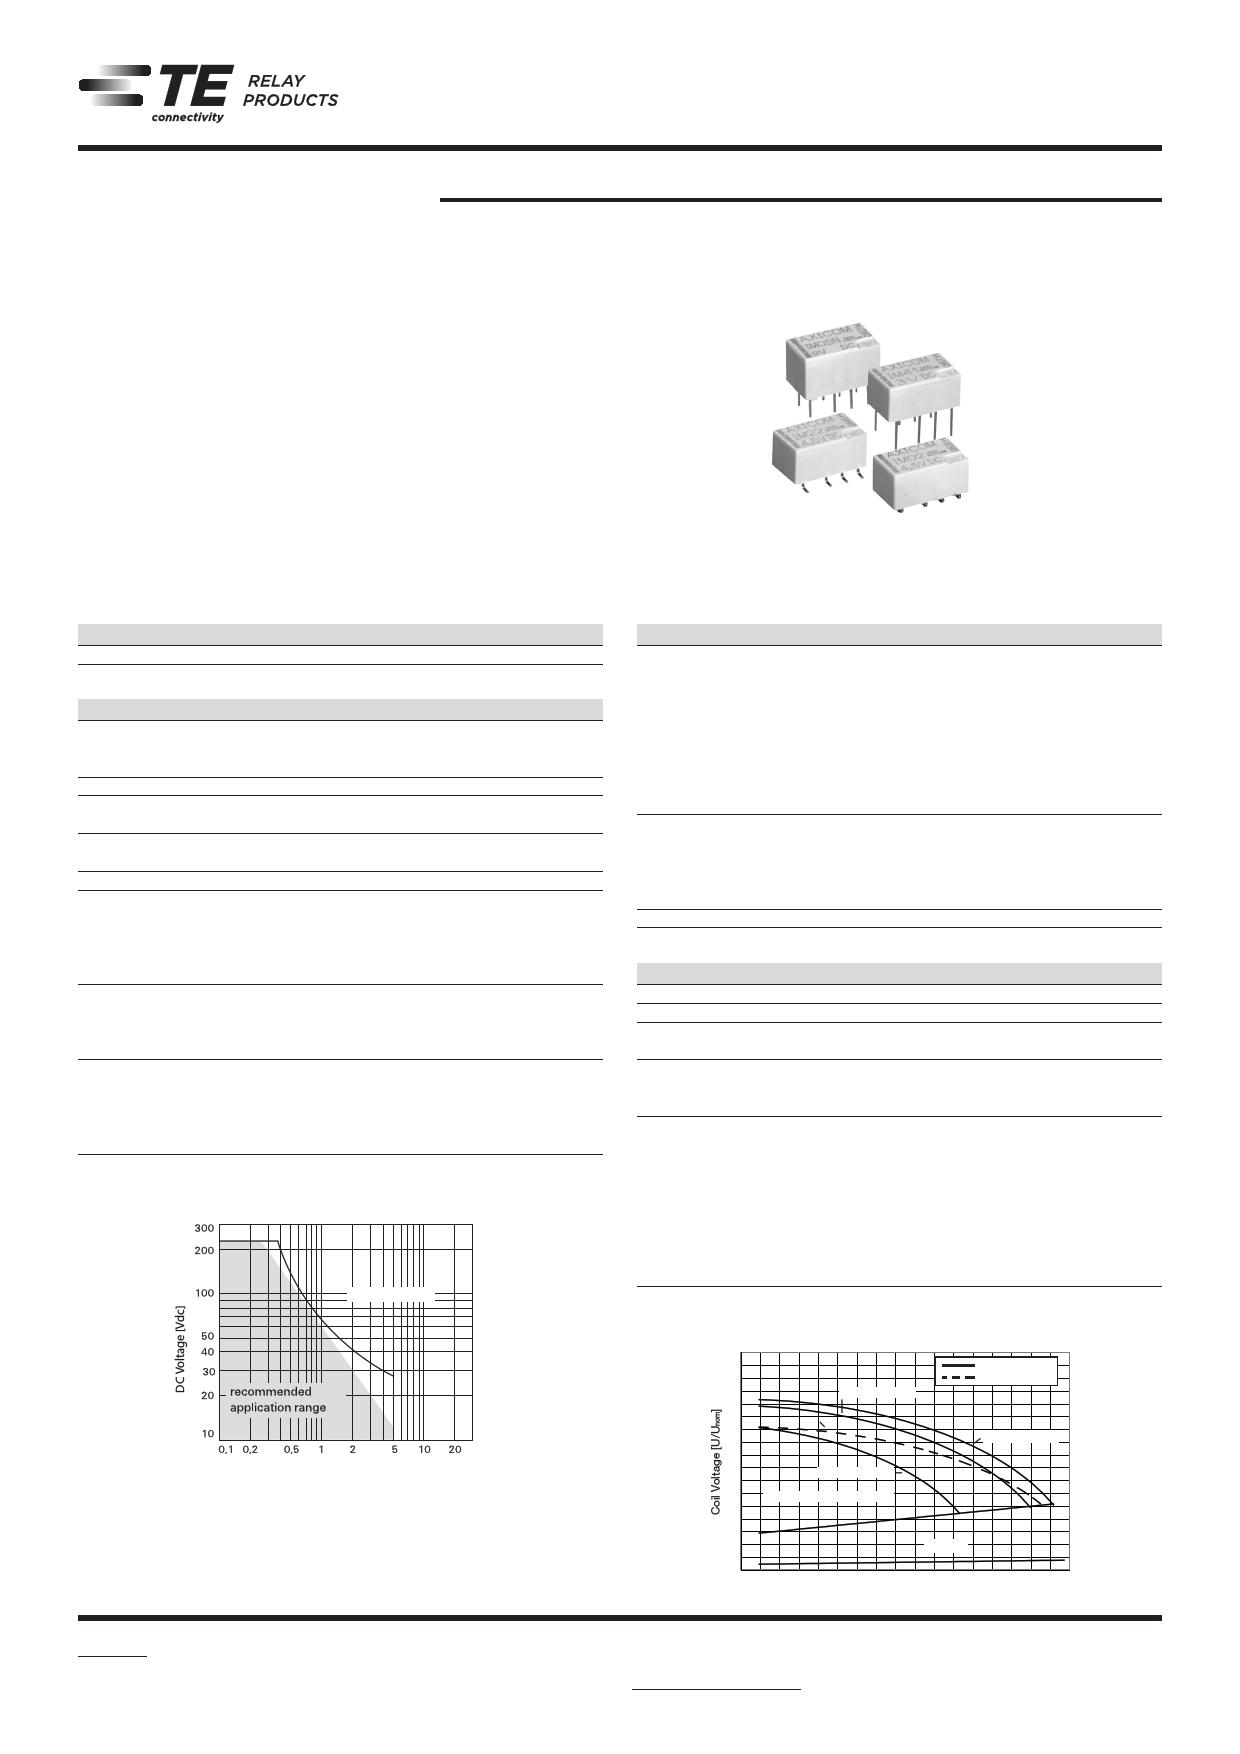 1-1462038-6 Даташит, Описание, Даташиты